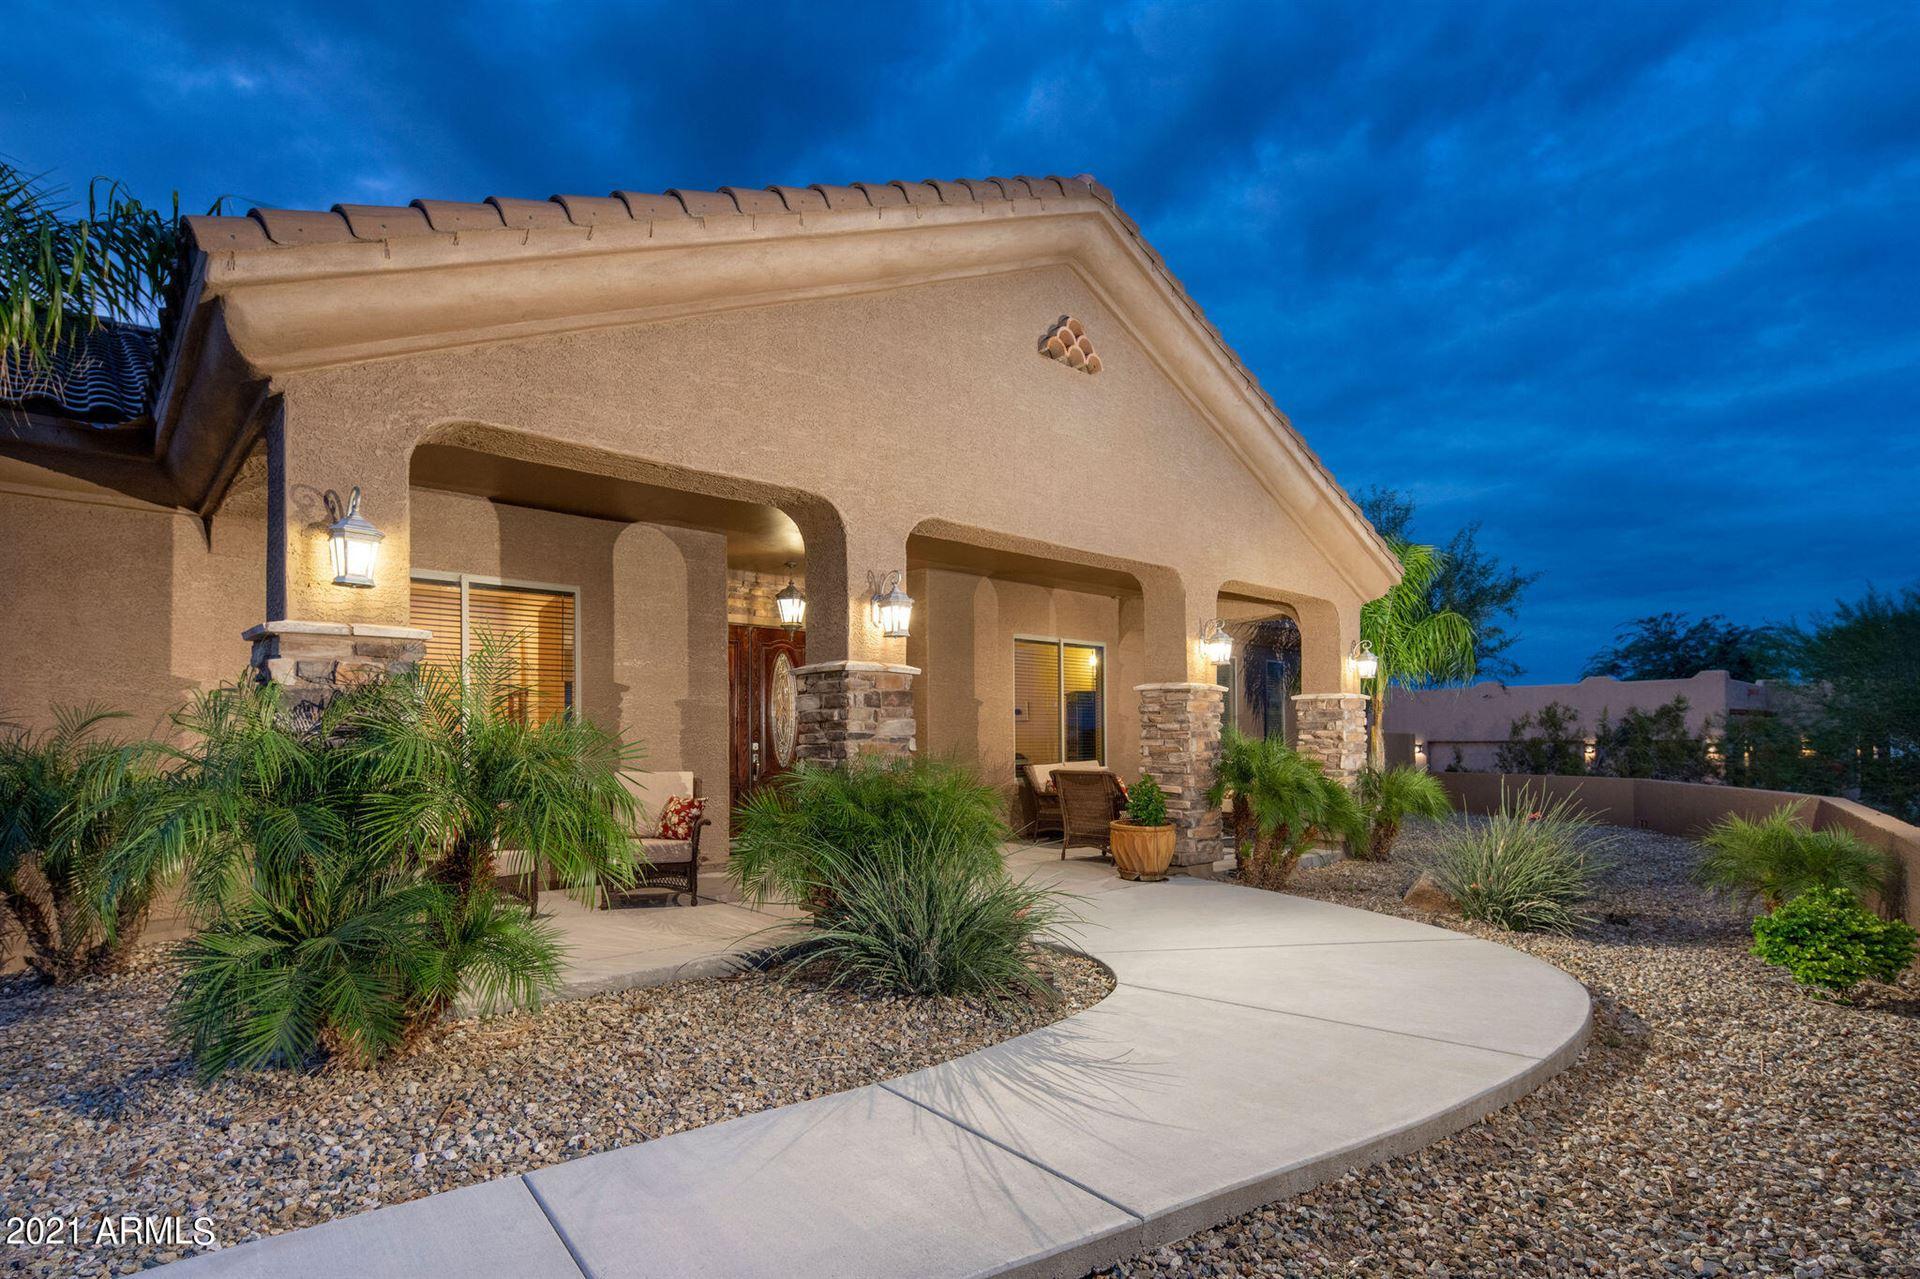 2840 PERCHERON Road, Wickenburg, AZ 85390 - MLS#: 6265646